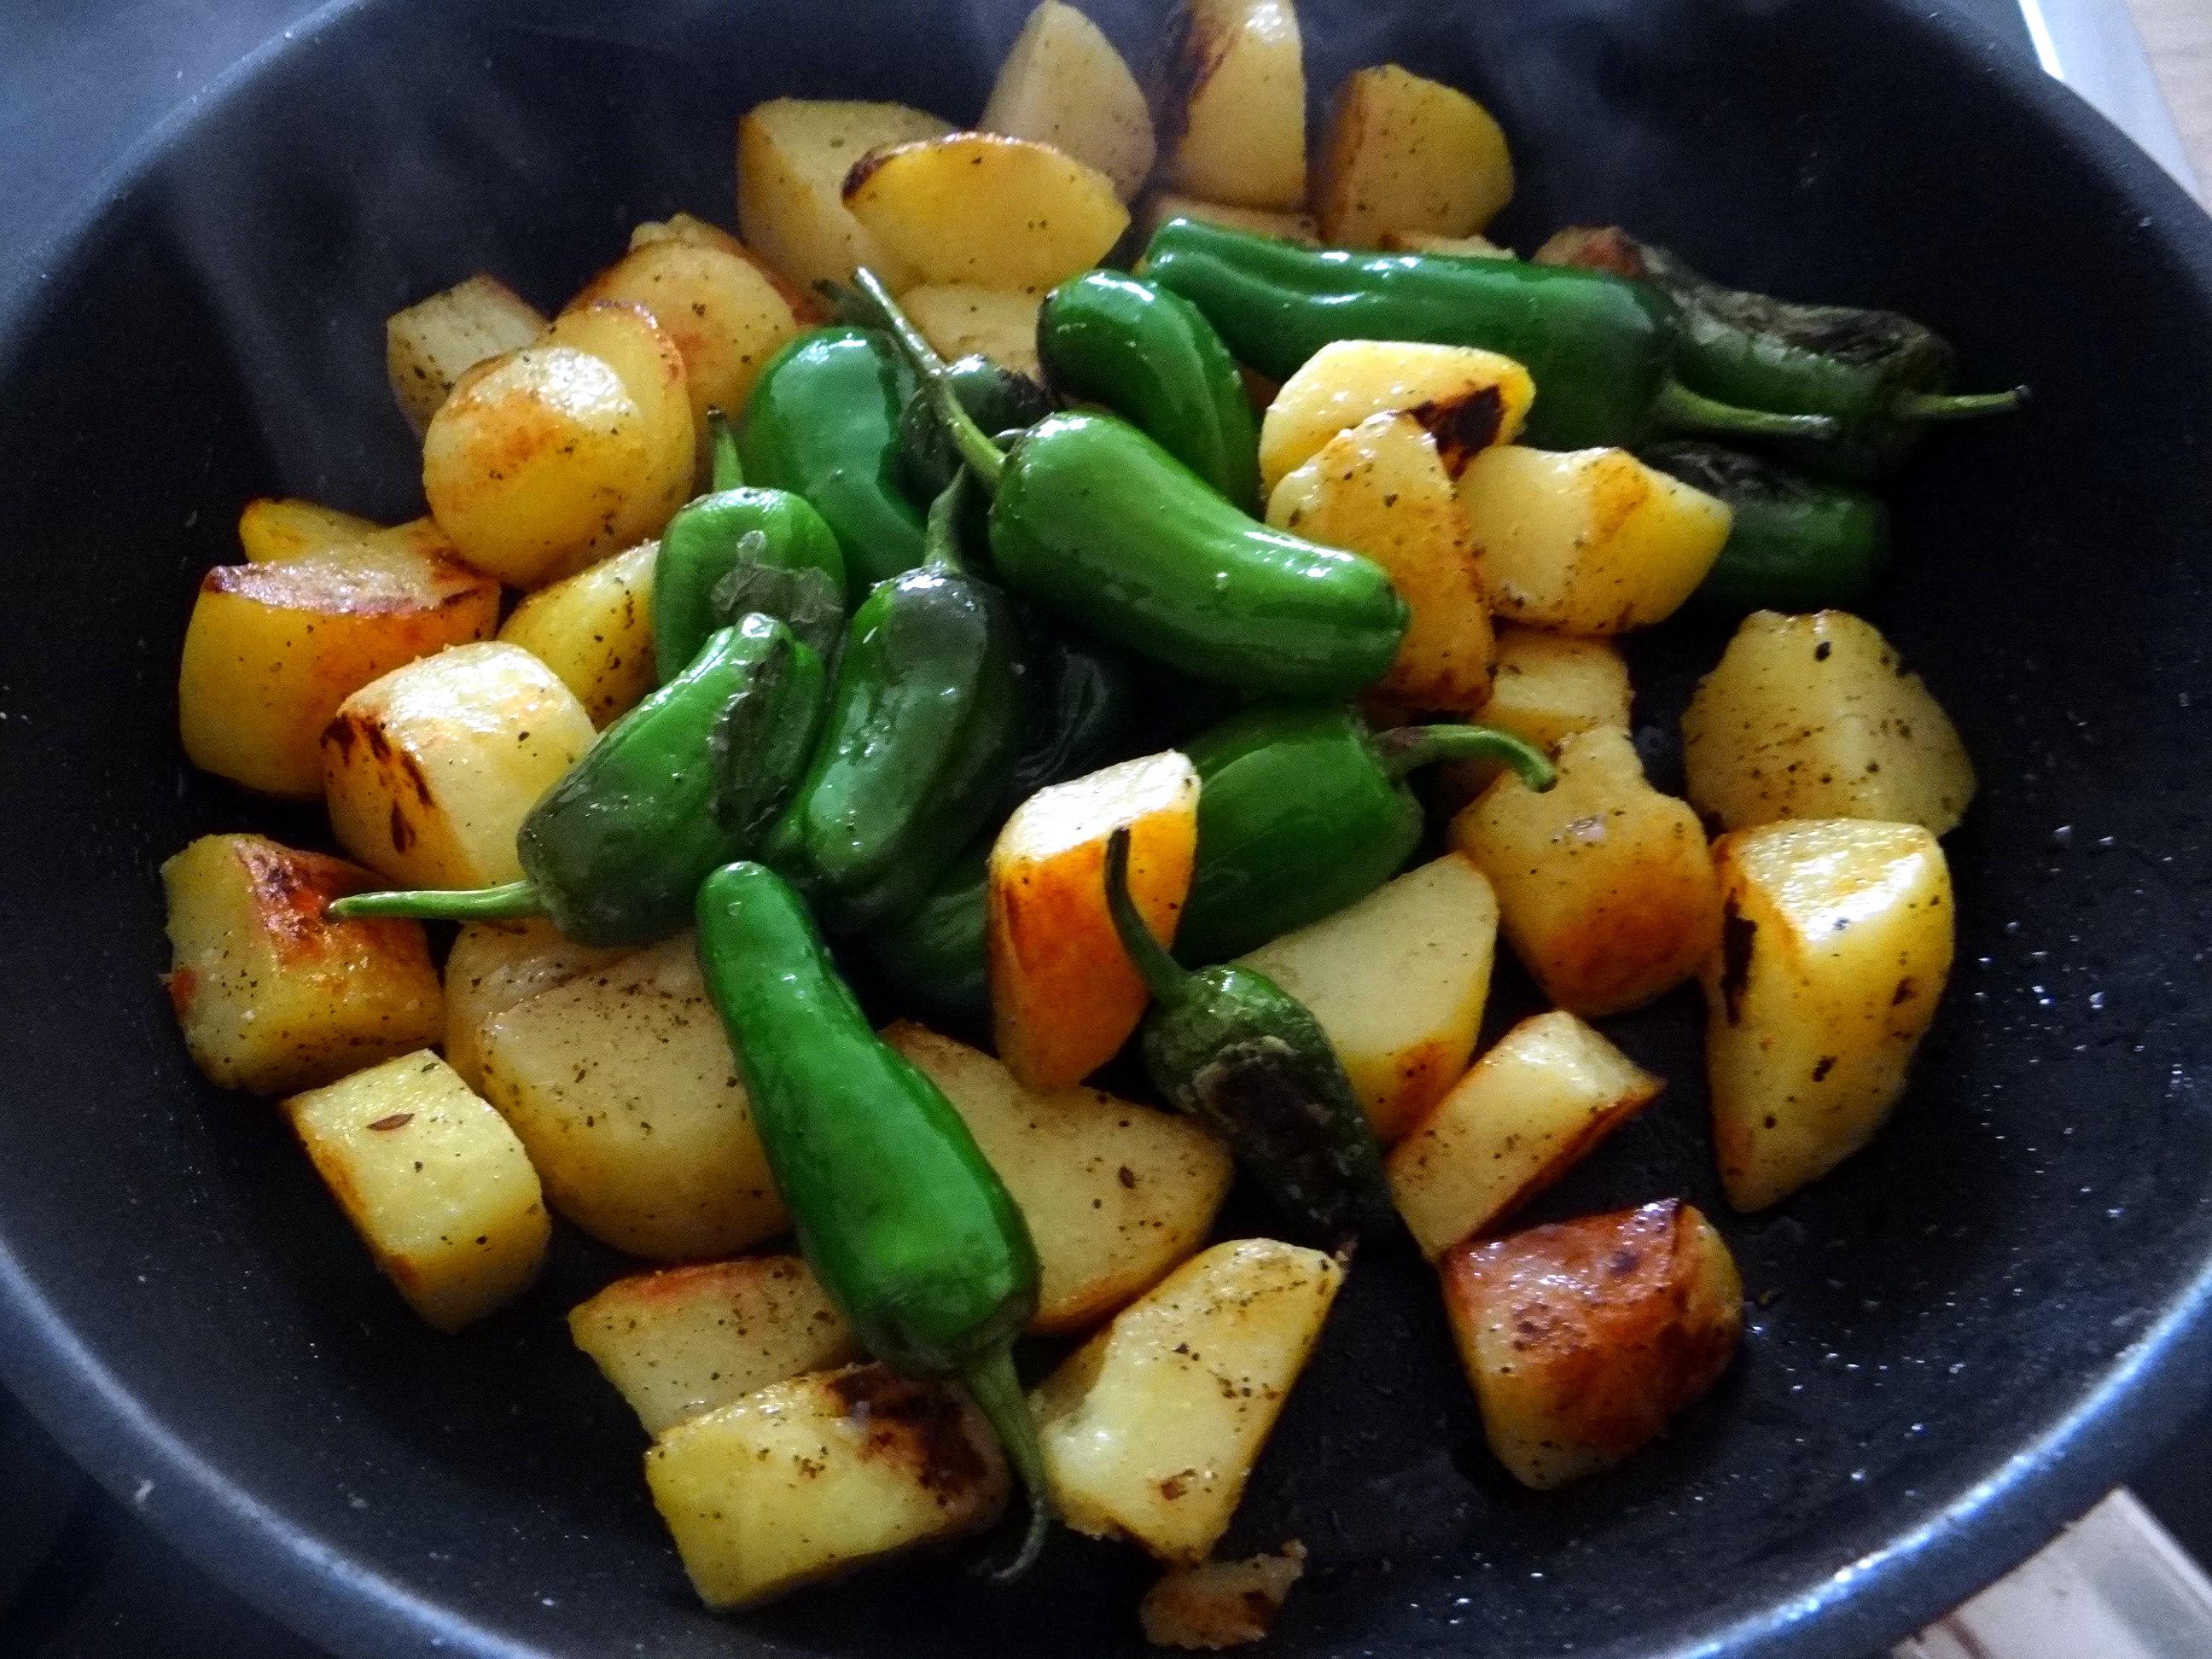 Fritierte Portobello,Bratkartoffeln,Pimientos,Salat,vegan (14)